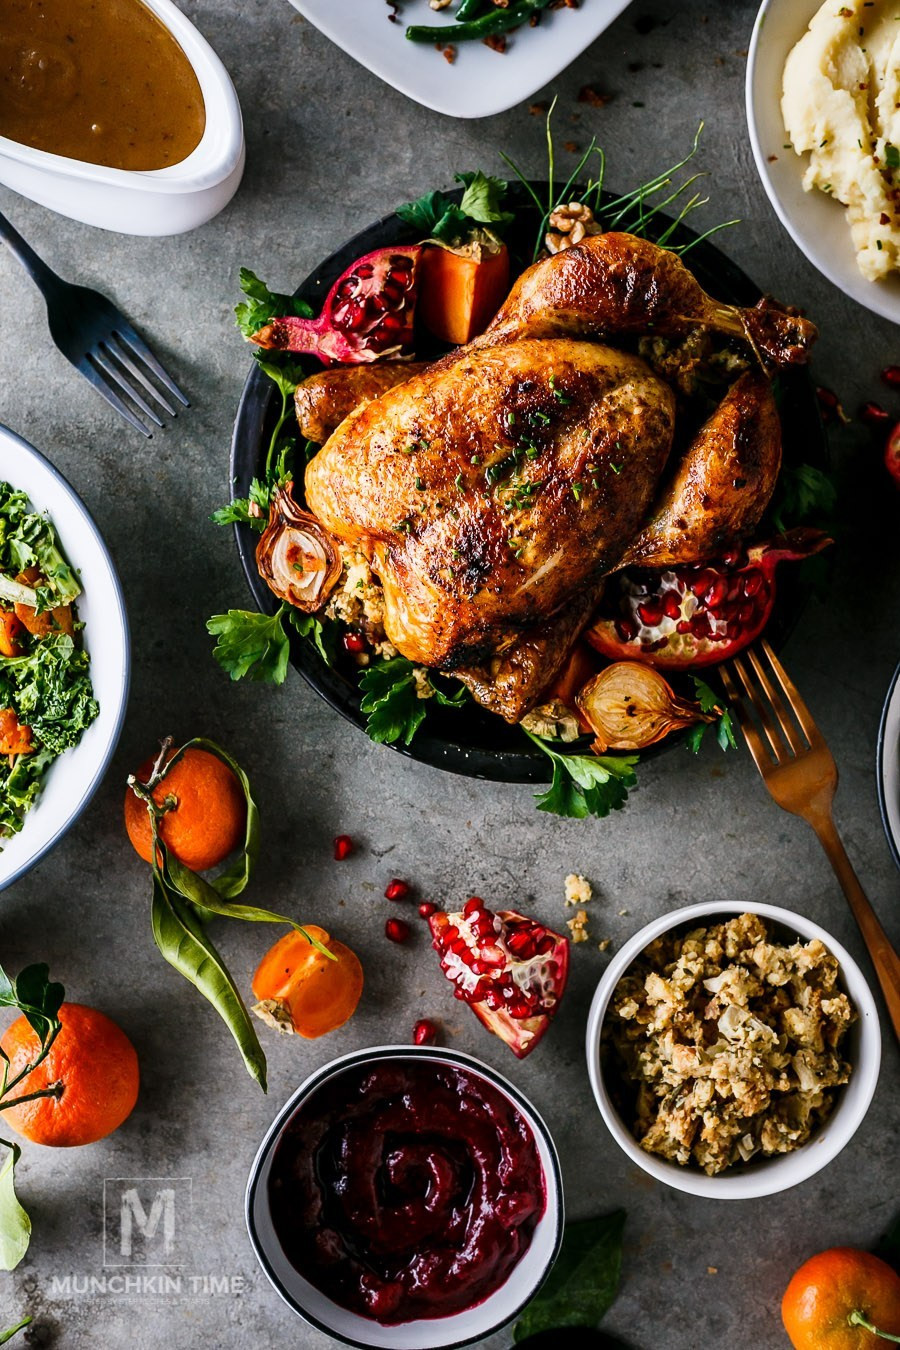 Whole Foods Thanksgiving Dinner 2017  7 Thanksgiving Dinner Ideas 2017 Munchkin Time